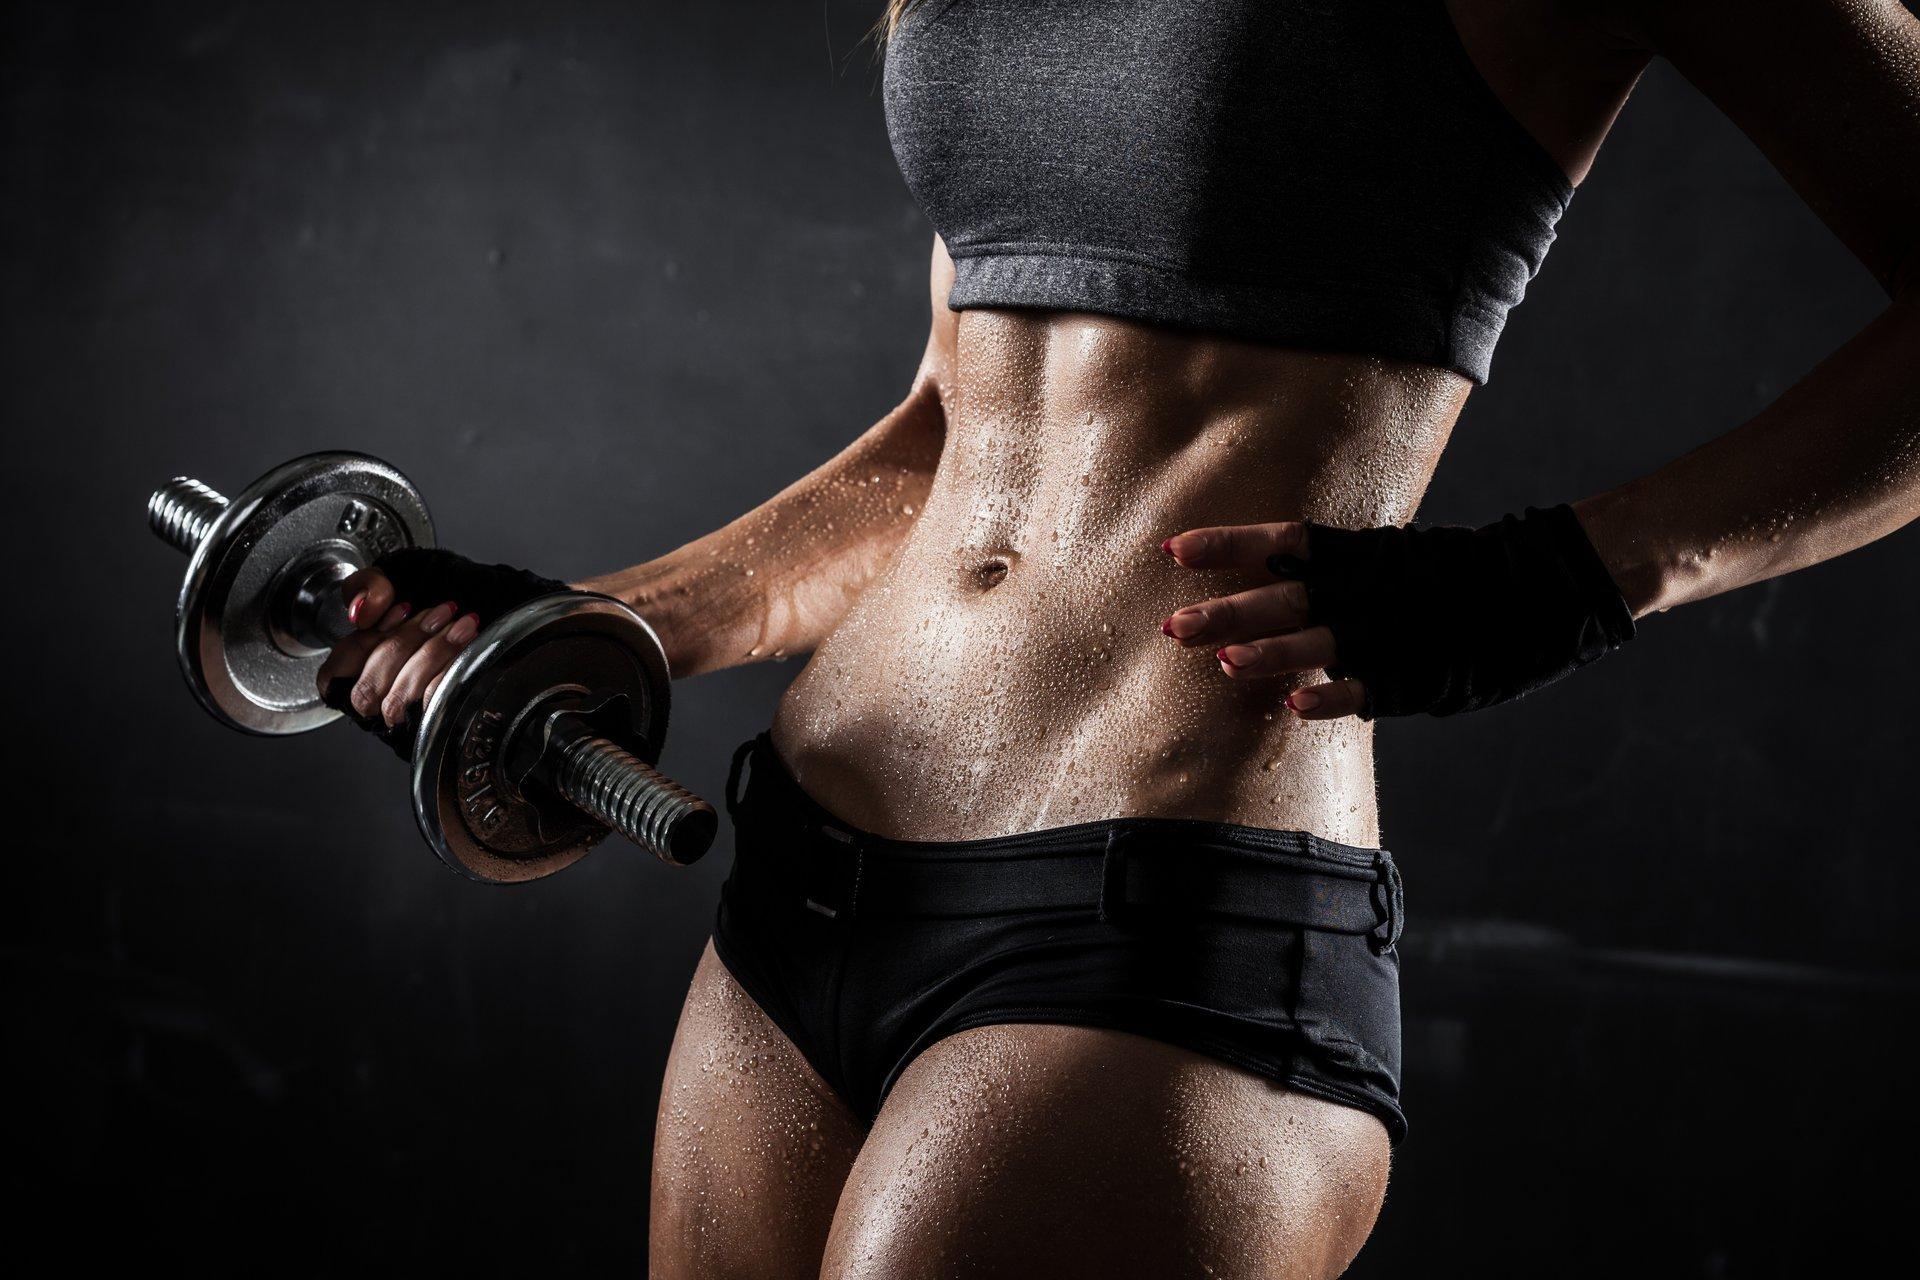 Sweaty females exercising, neked suck